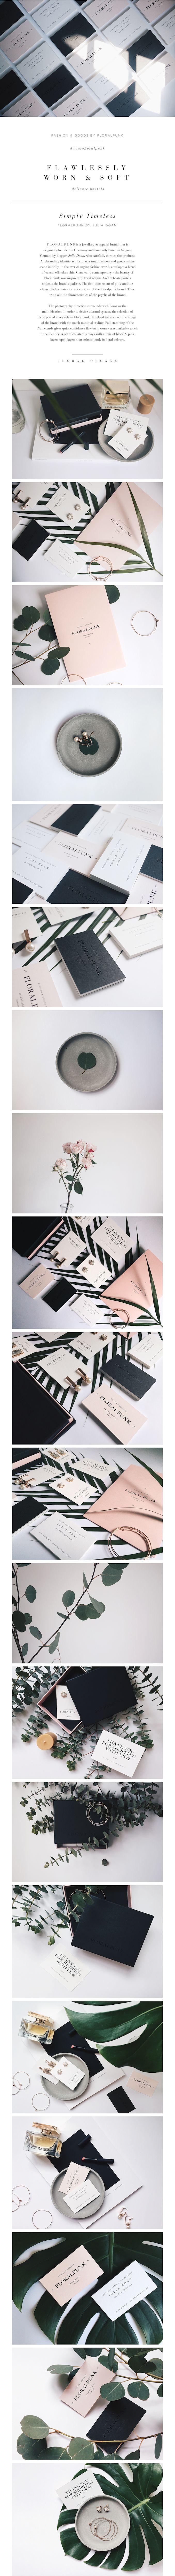 super beautiful. love this #design #branding #identity https://www.behance.net/gallery/26522655/FLORALPUNK